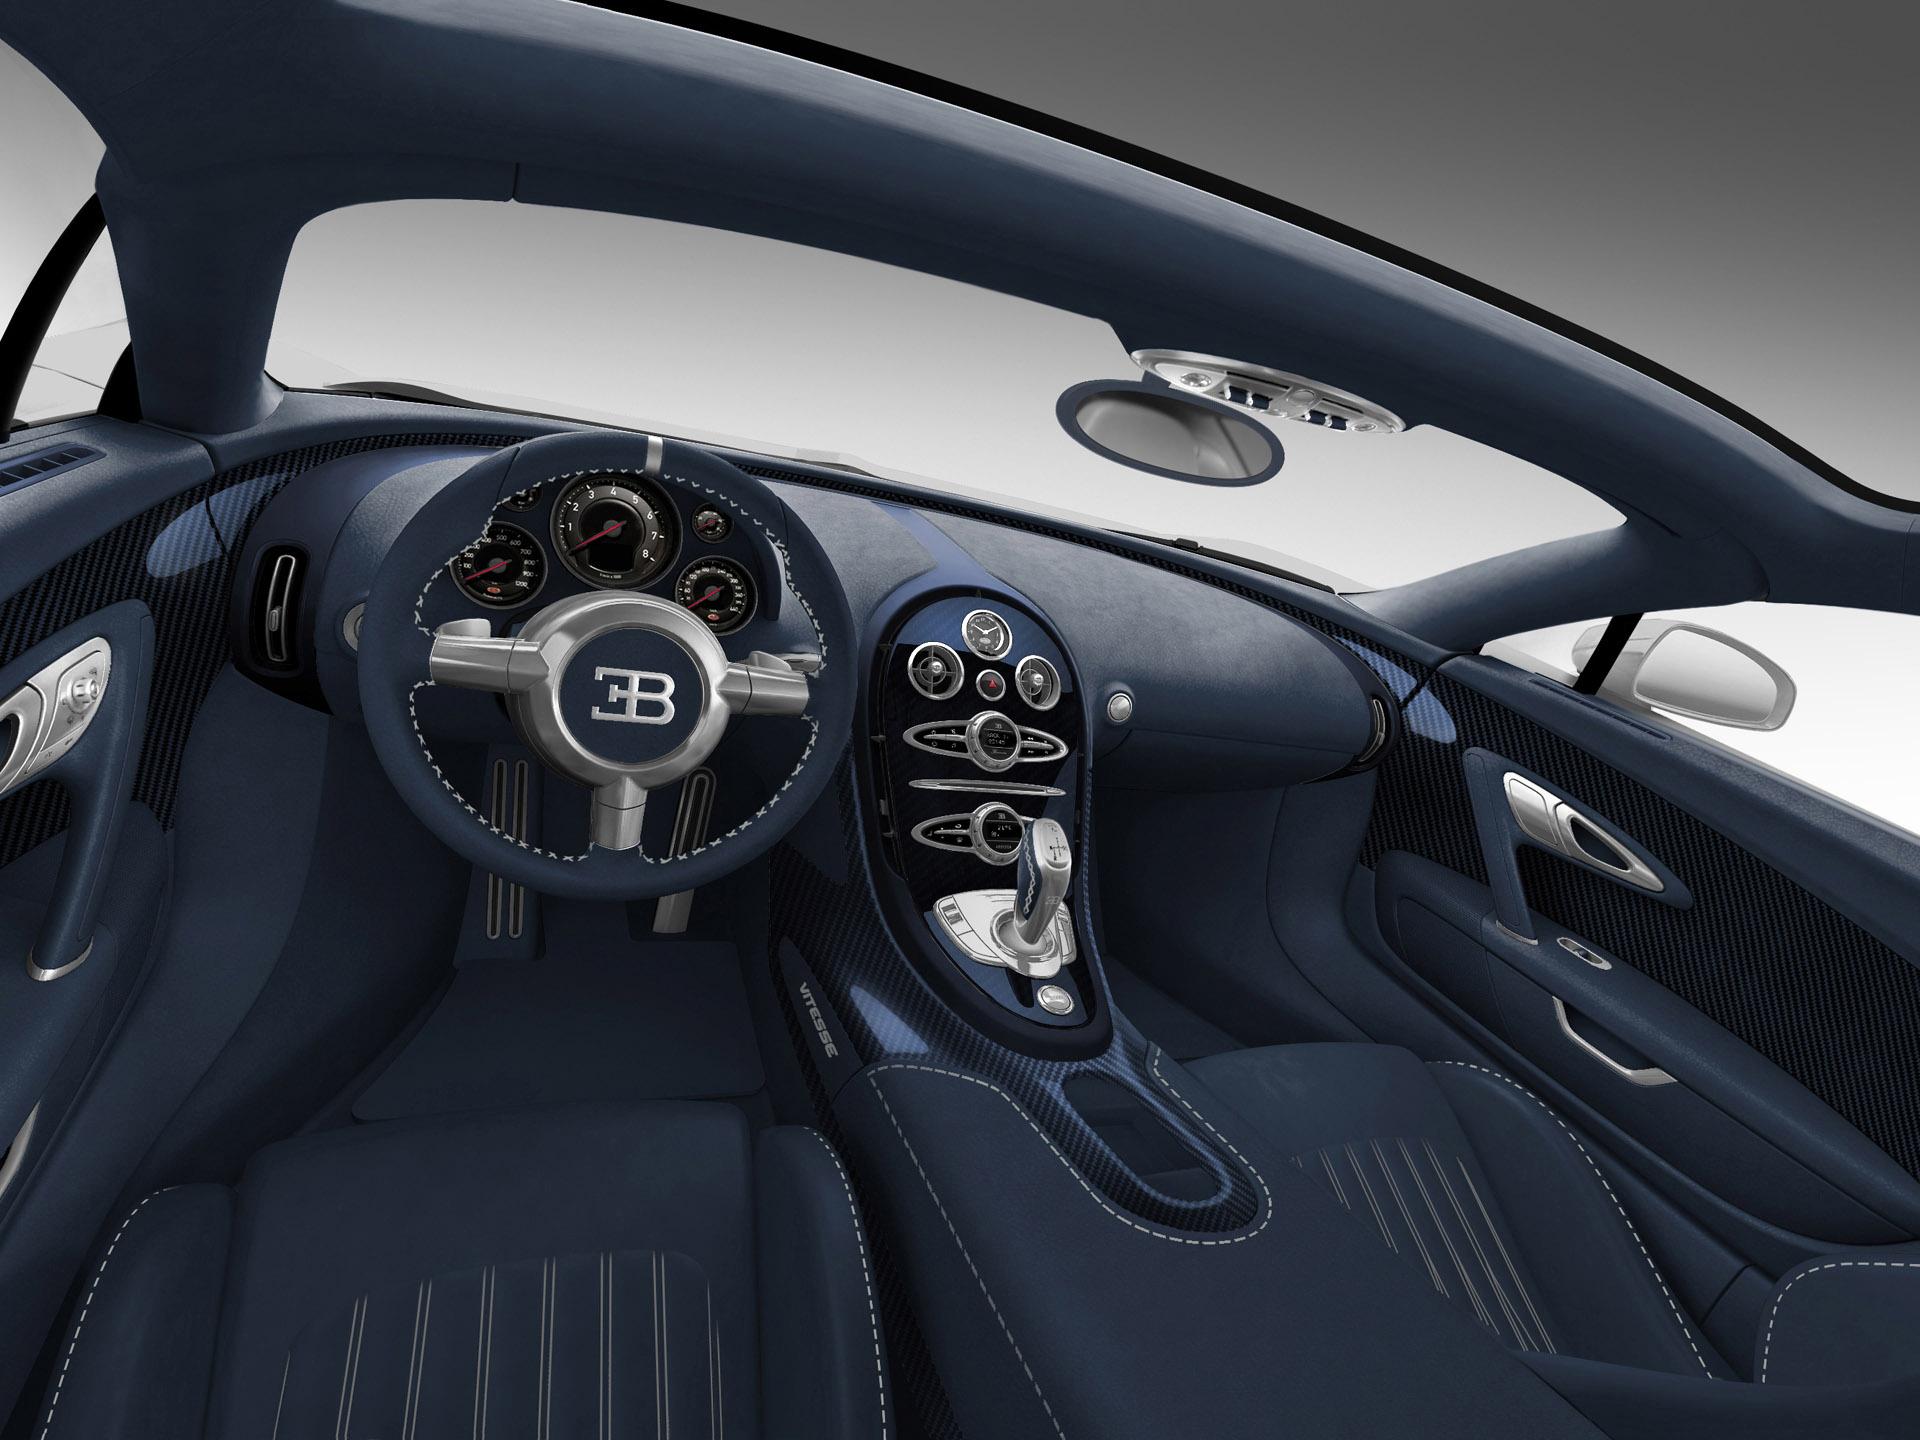 bugatti-veyron-16-4-grand-sport-vitesse-rafale-03 Astounding Xe Bugatti Veyron Grand Sport Vitesse Cars Trend